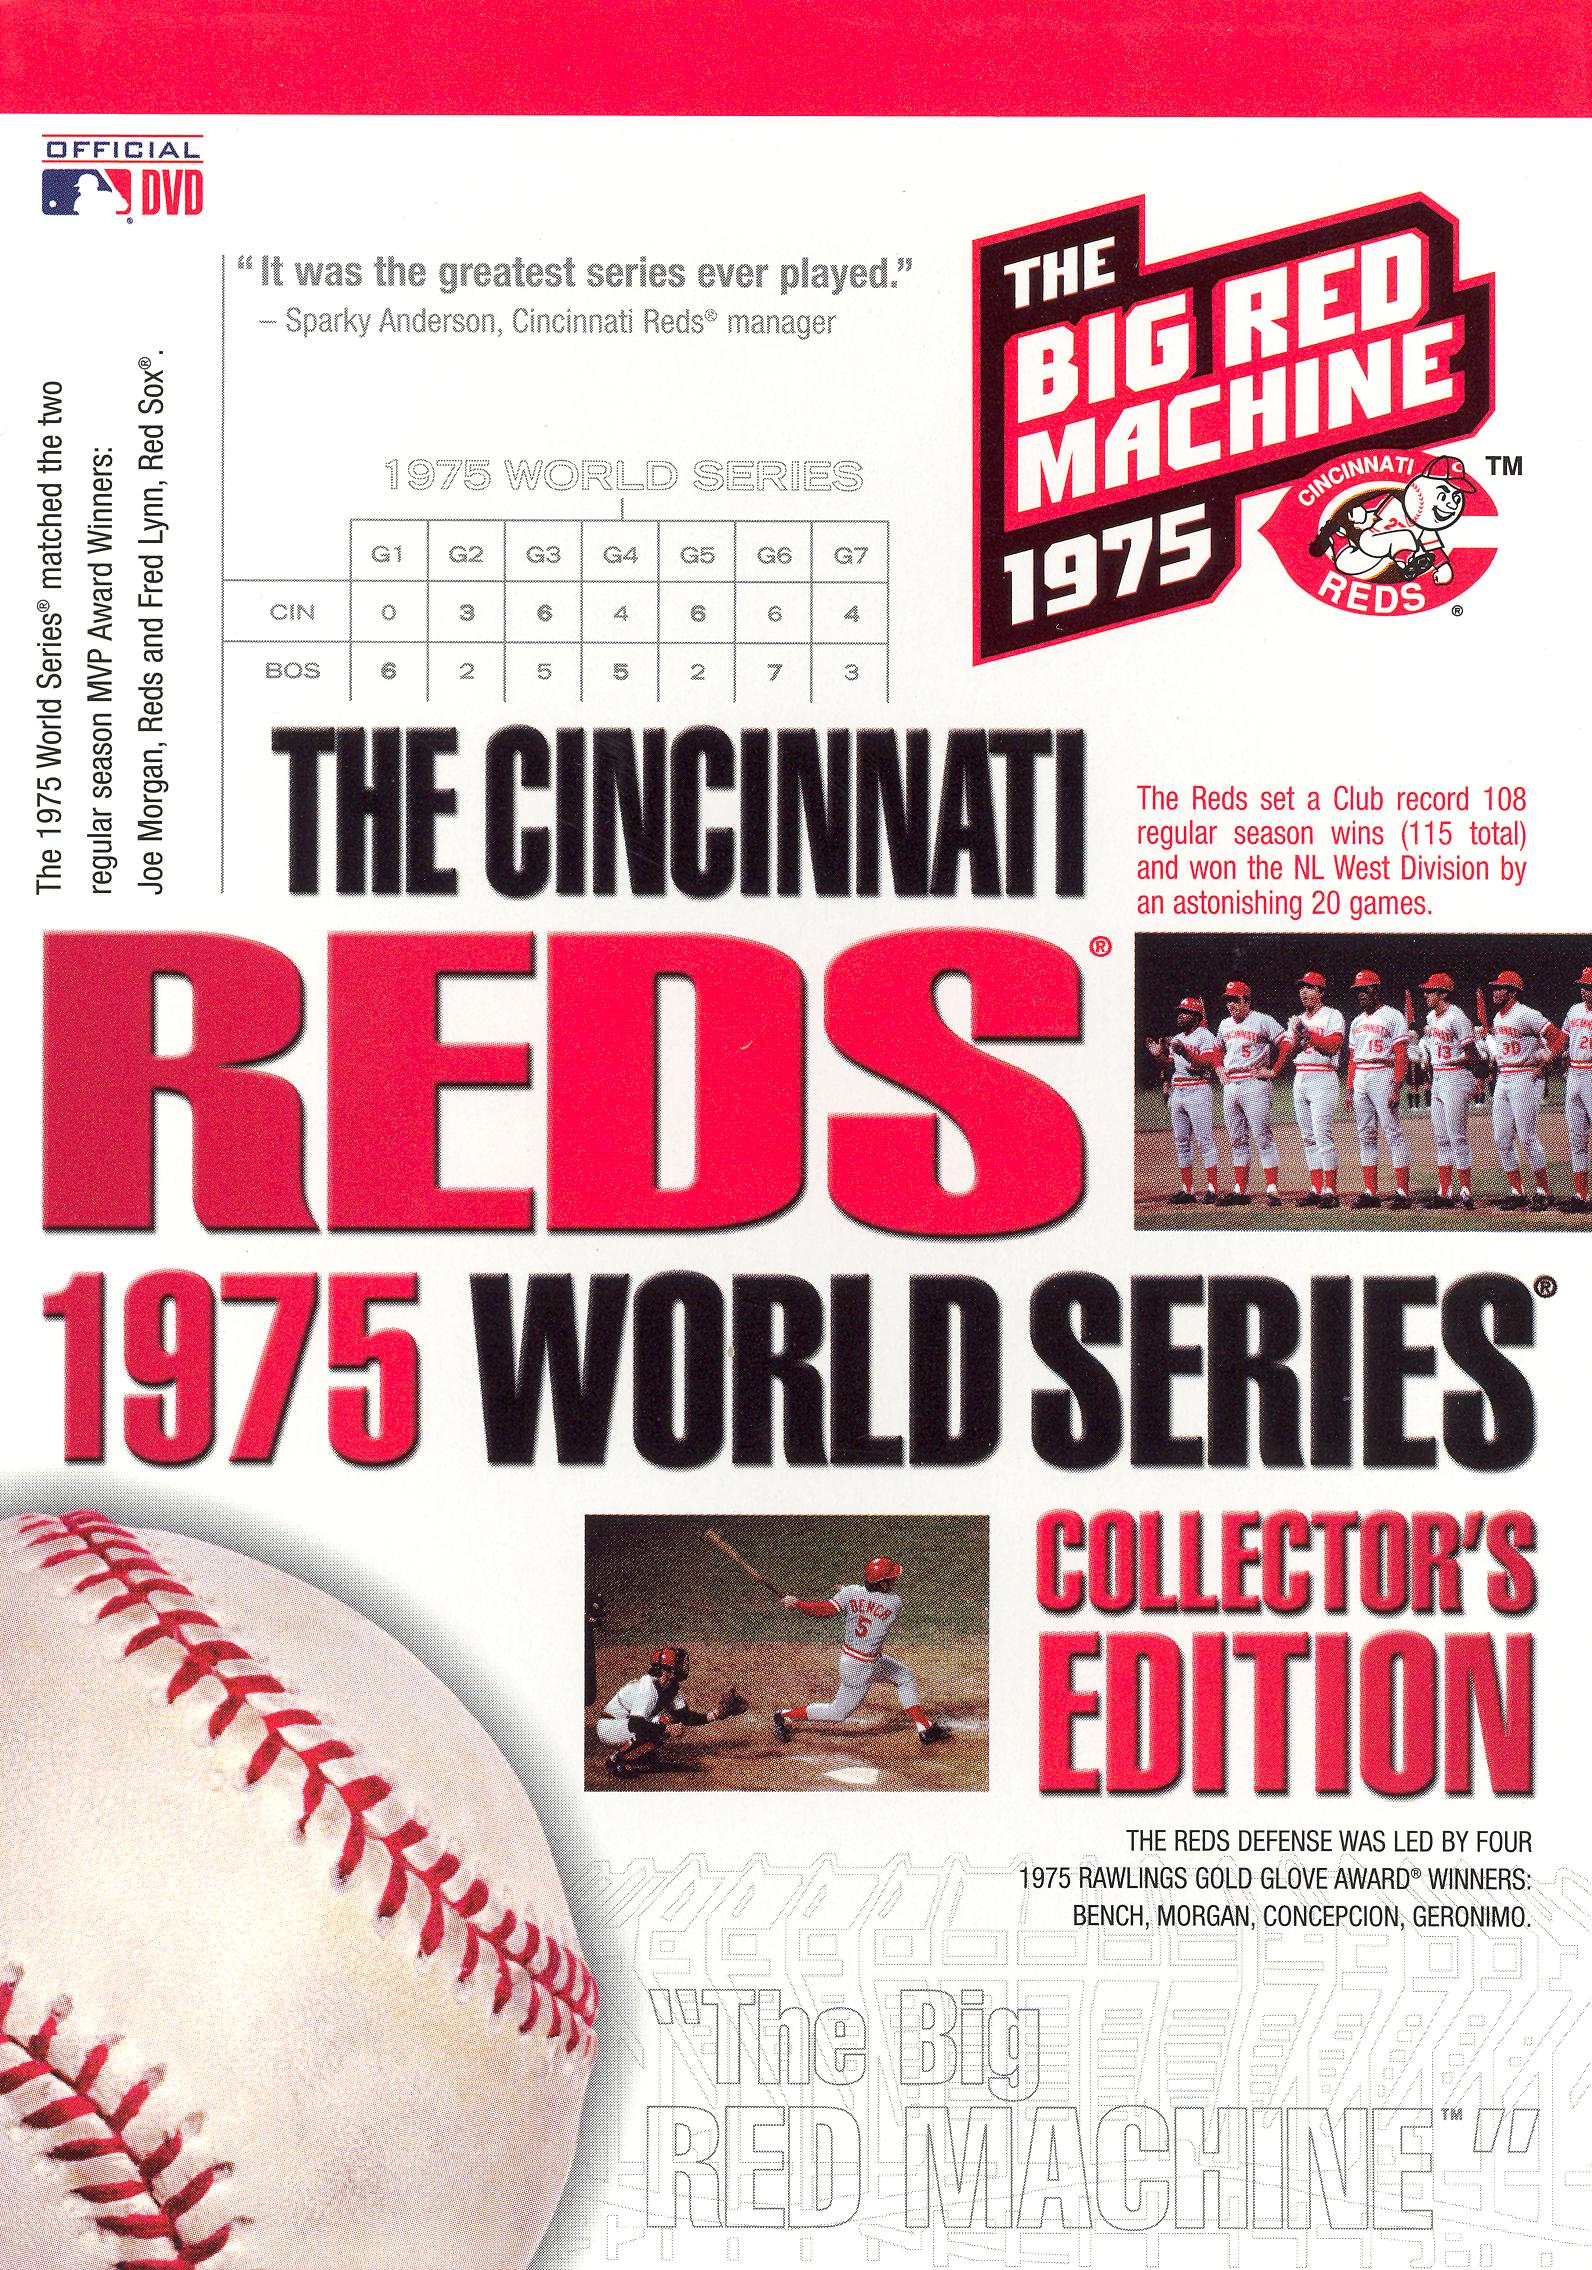 The Cincinnati Reds: 1975 World Series Collector's Edition